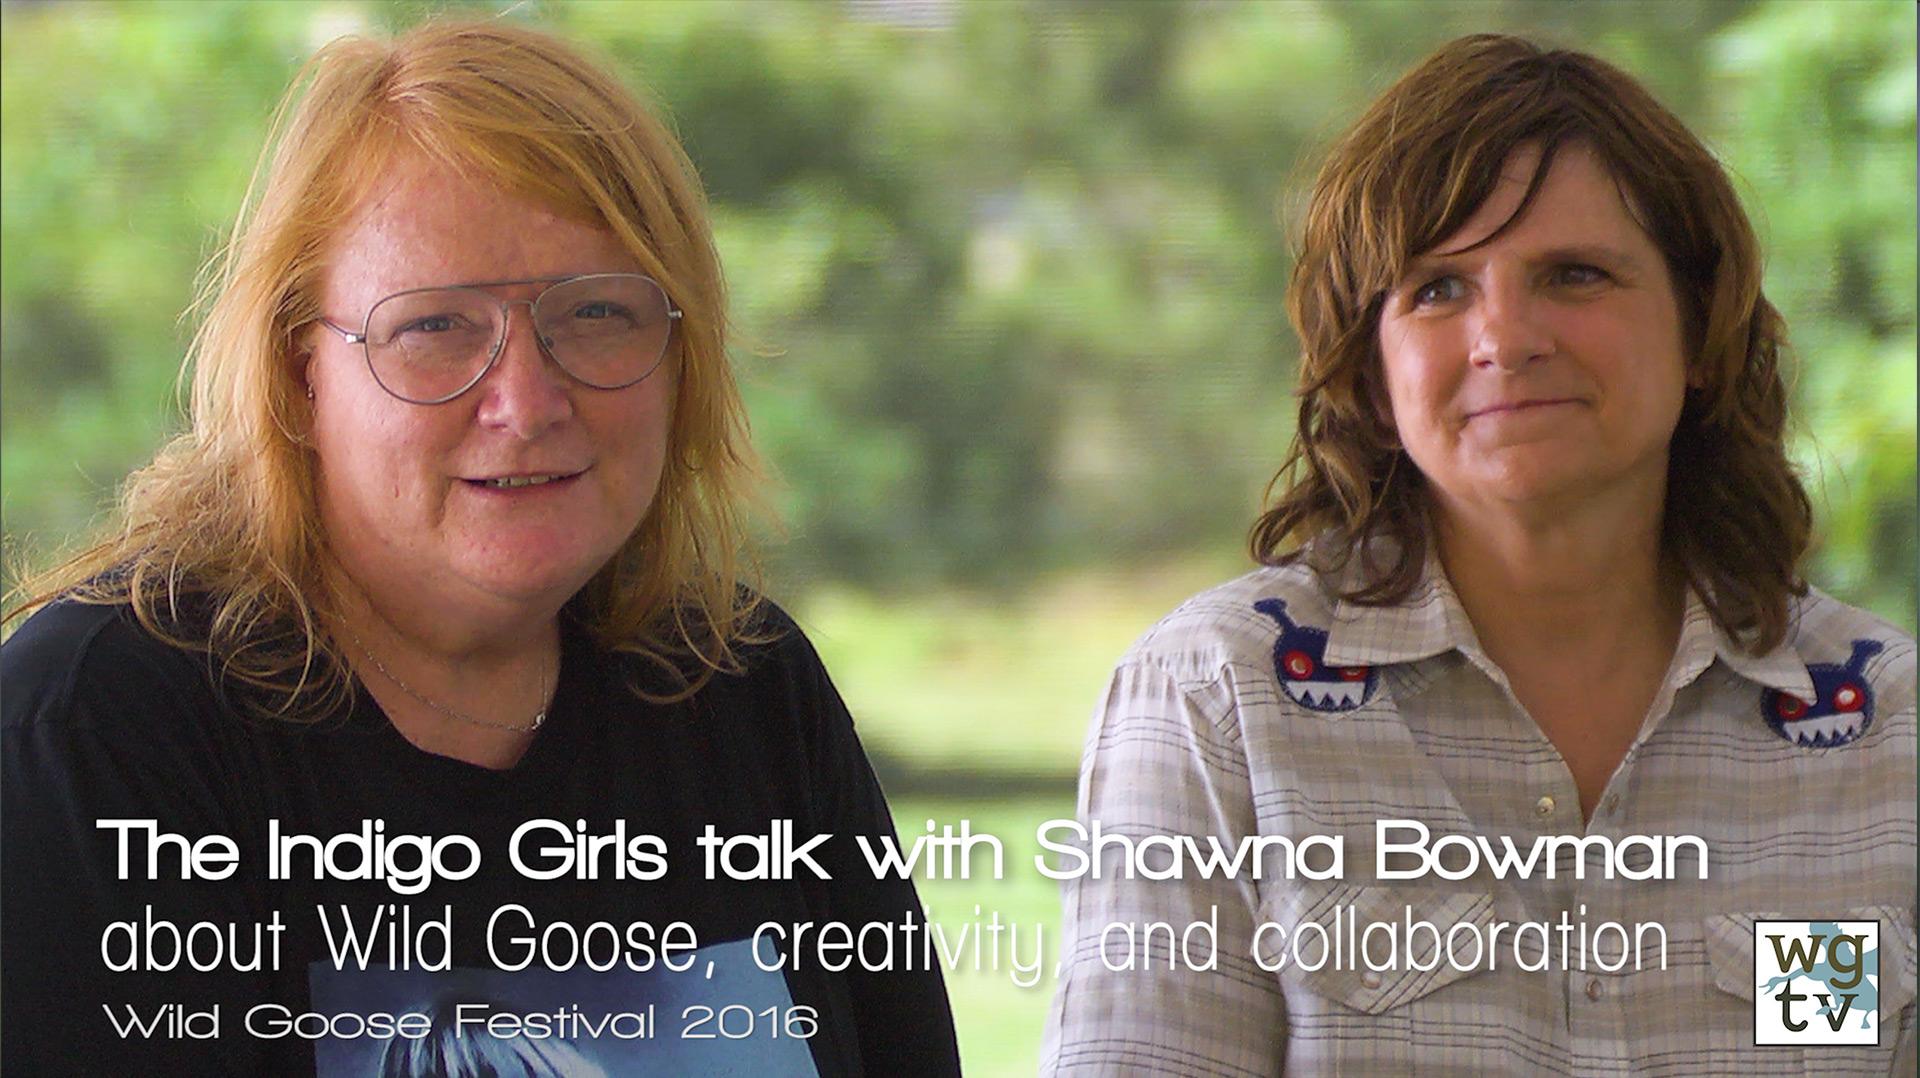 The Indigo Girls with Shawna Bowman